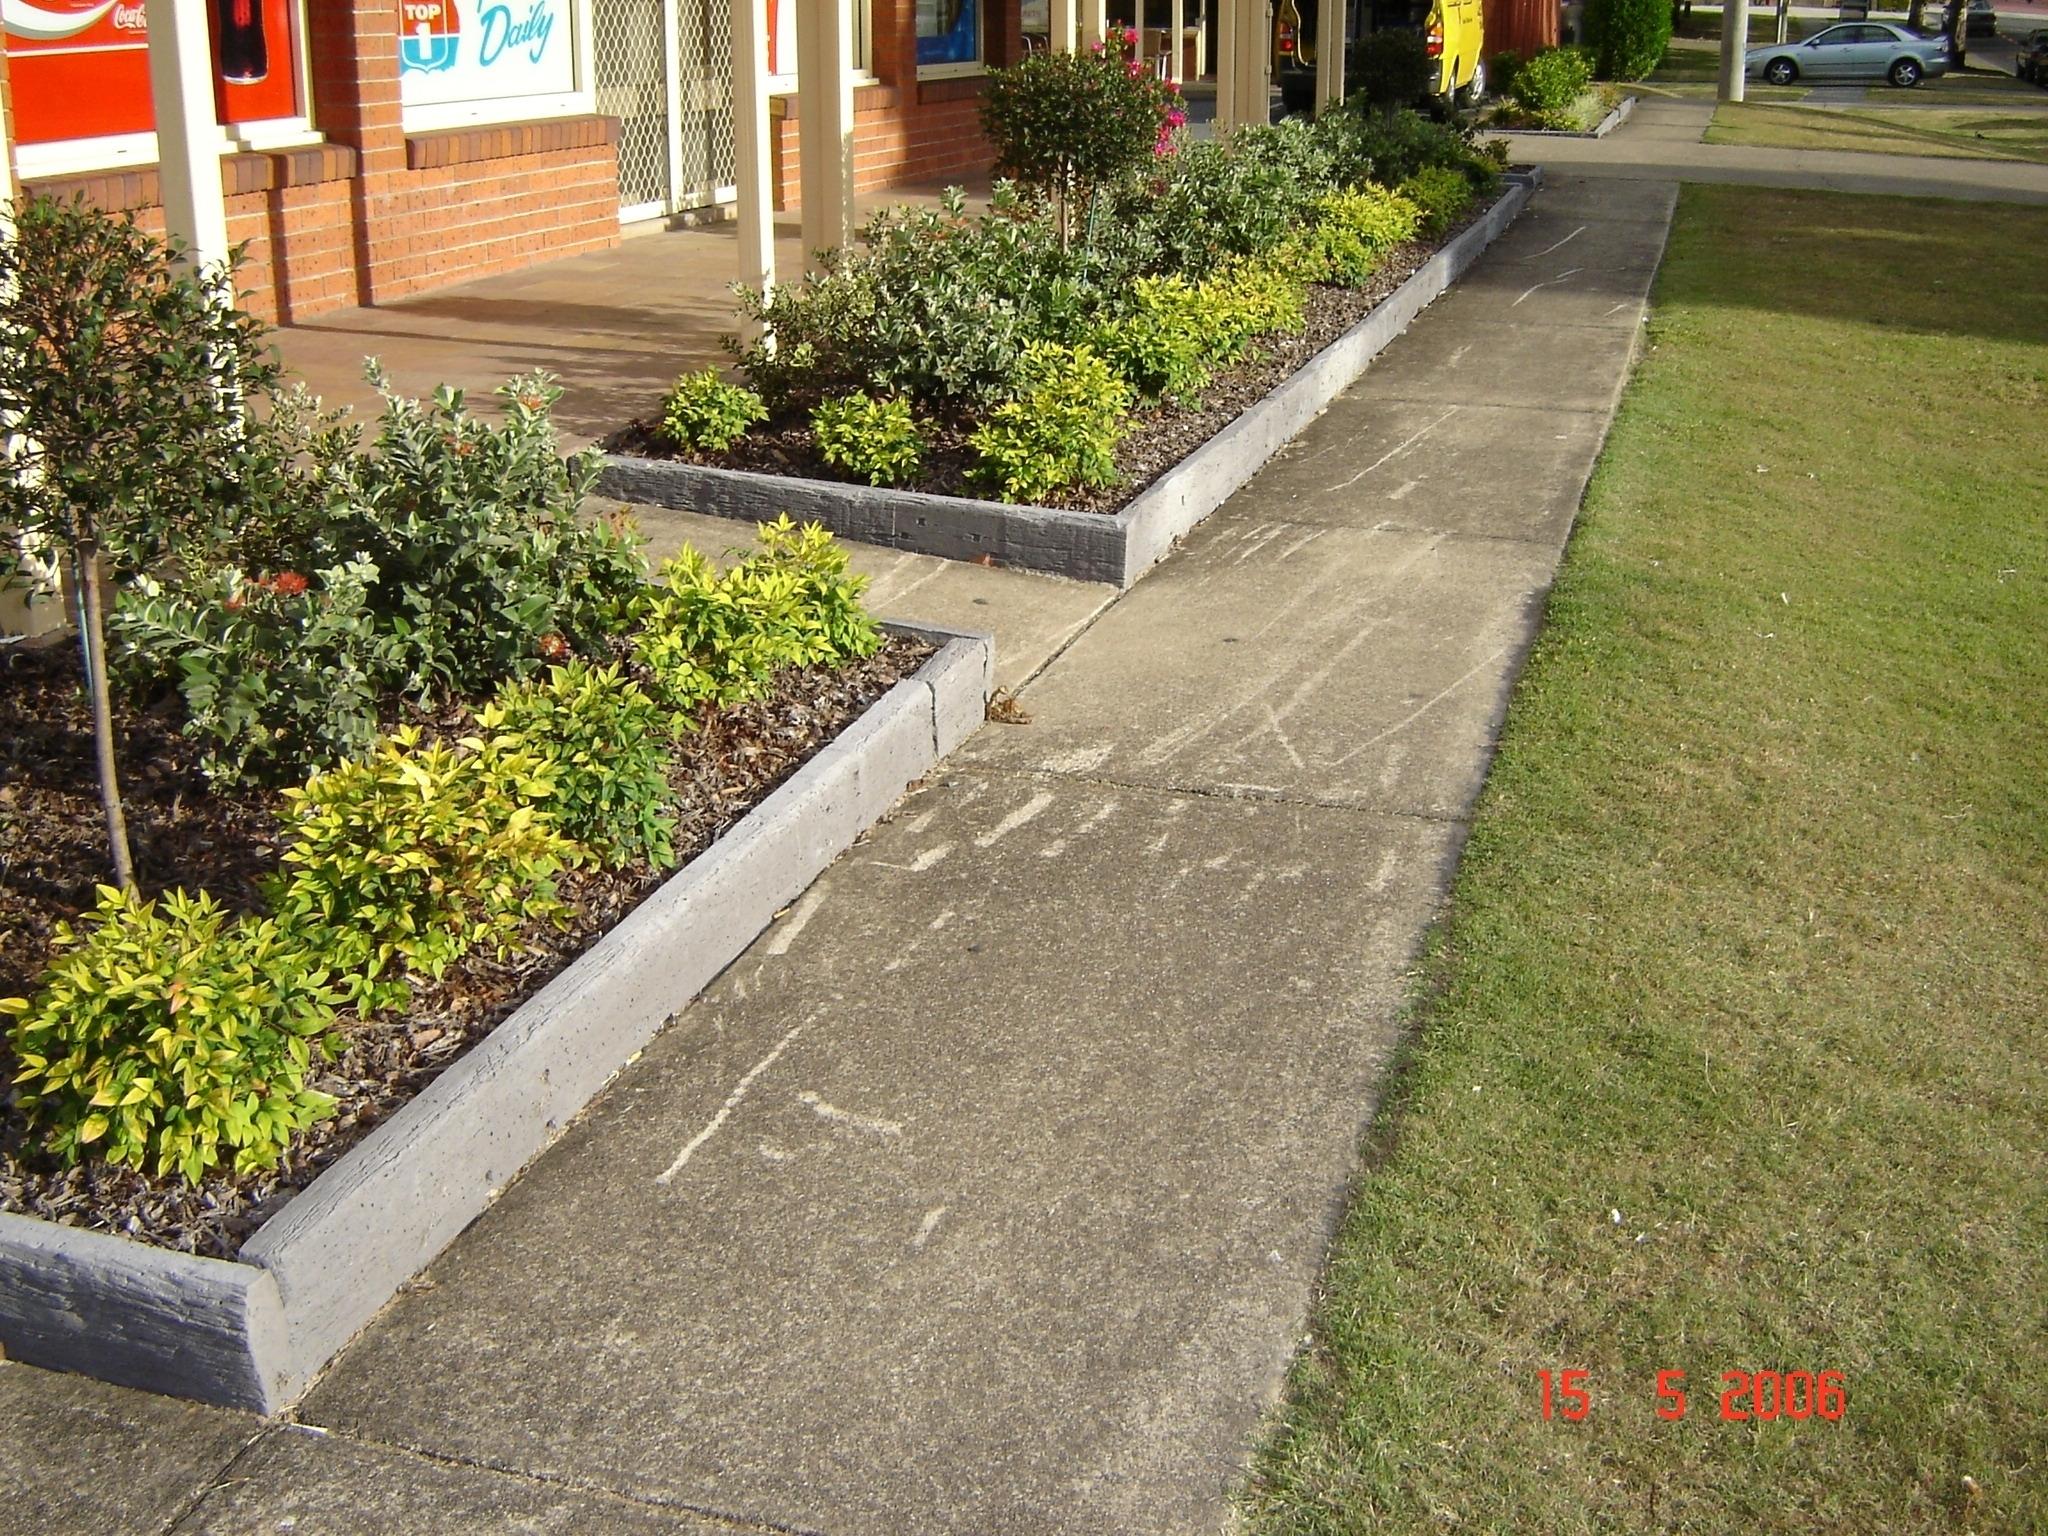 diy concrete landscape edging forms \u2014 randolph indoor and outdoor designdiy concrete landscape edging forms